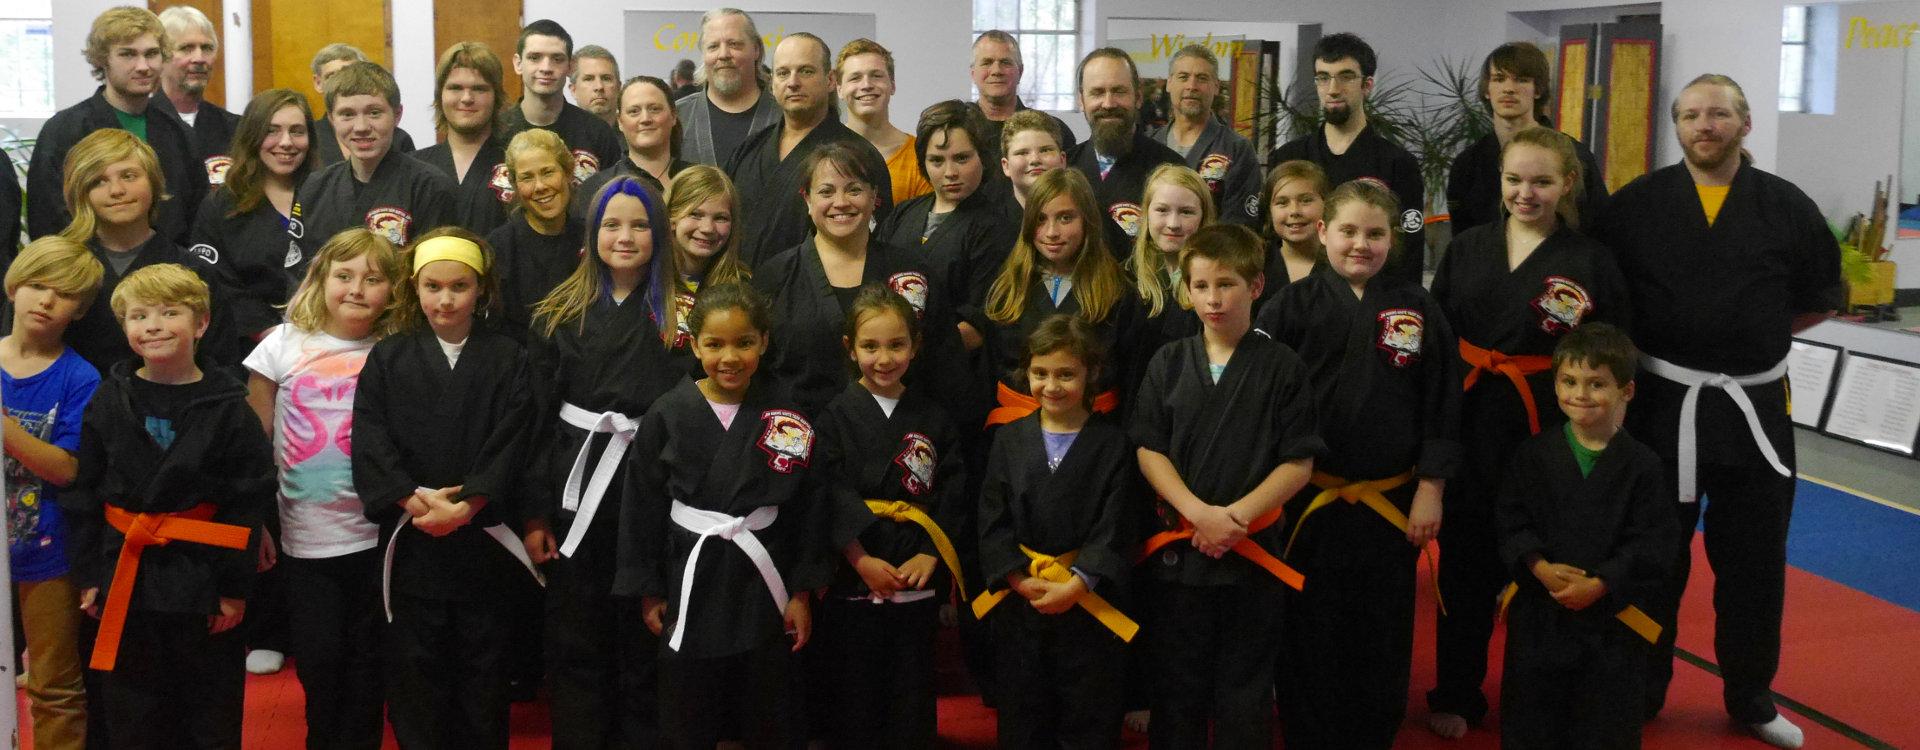 Self Defense System - Jim Adkins Martial Arts - Learn online or in dojo